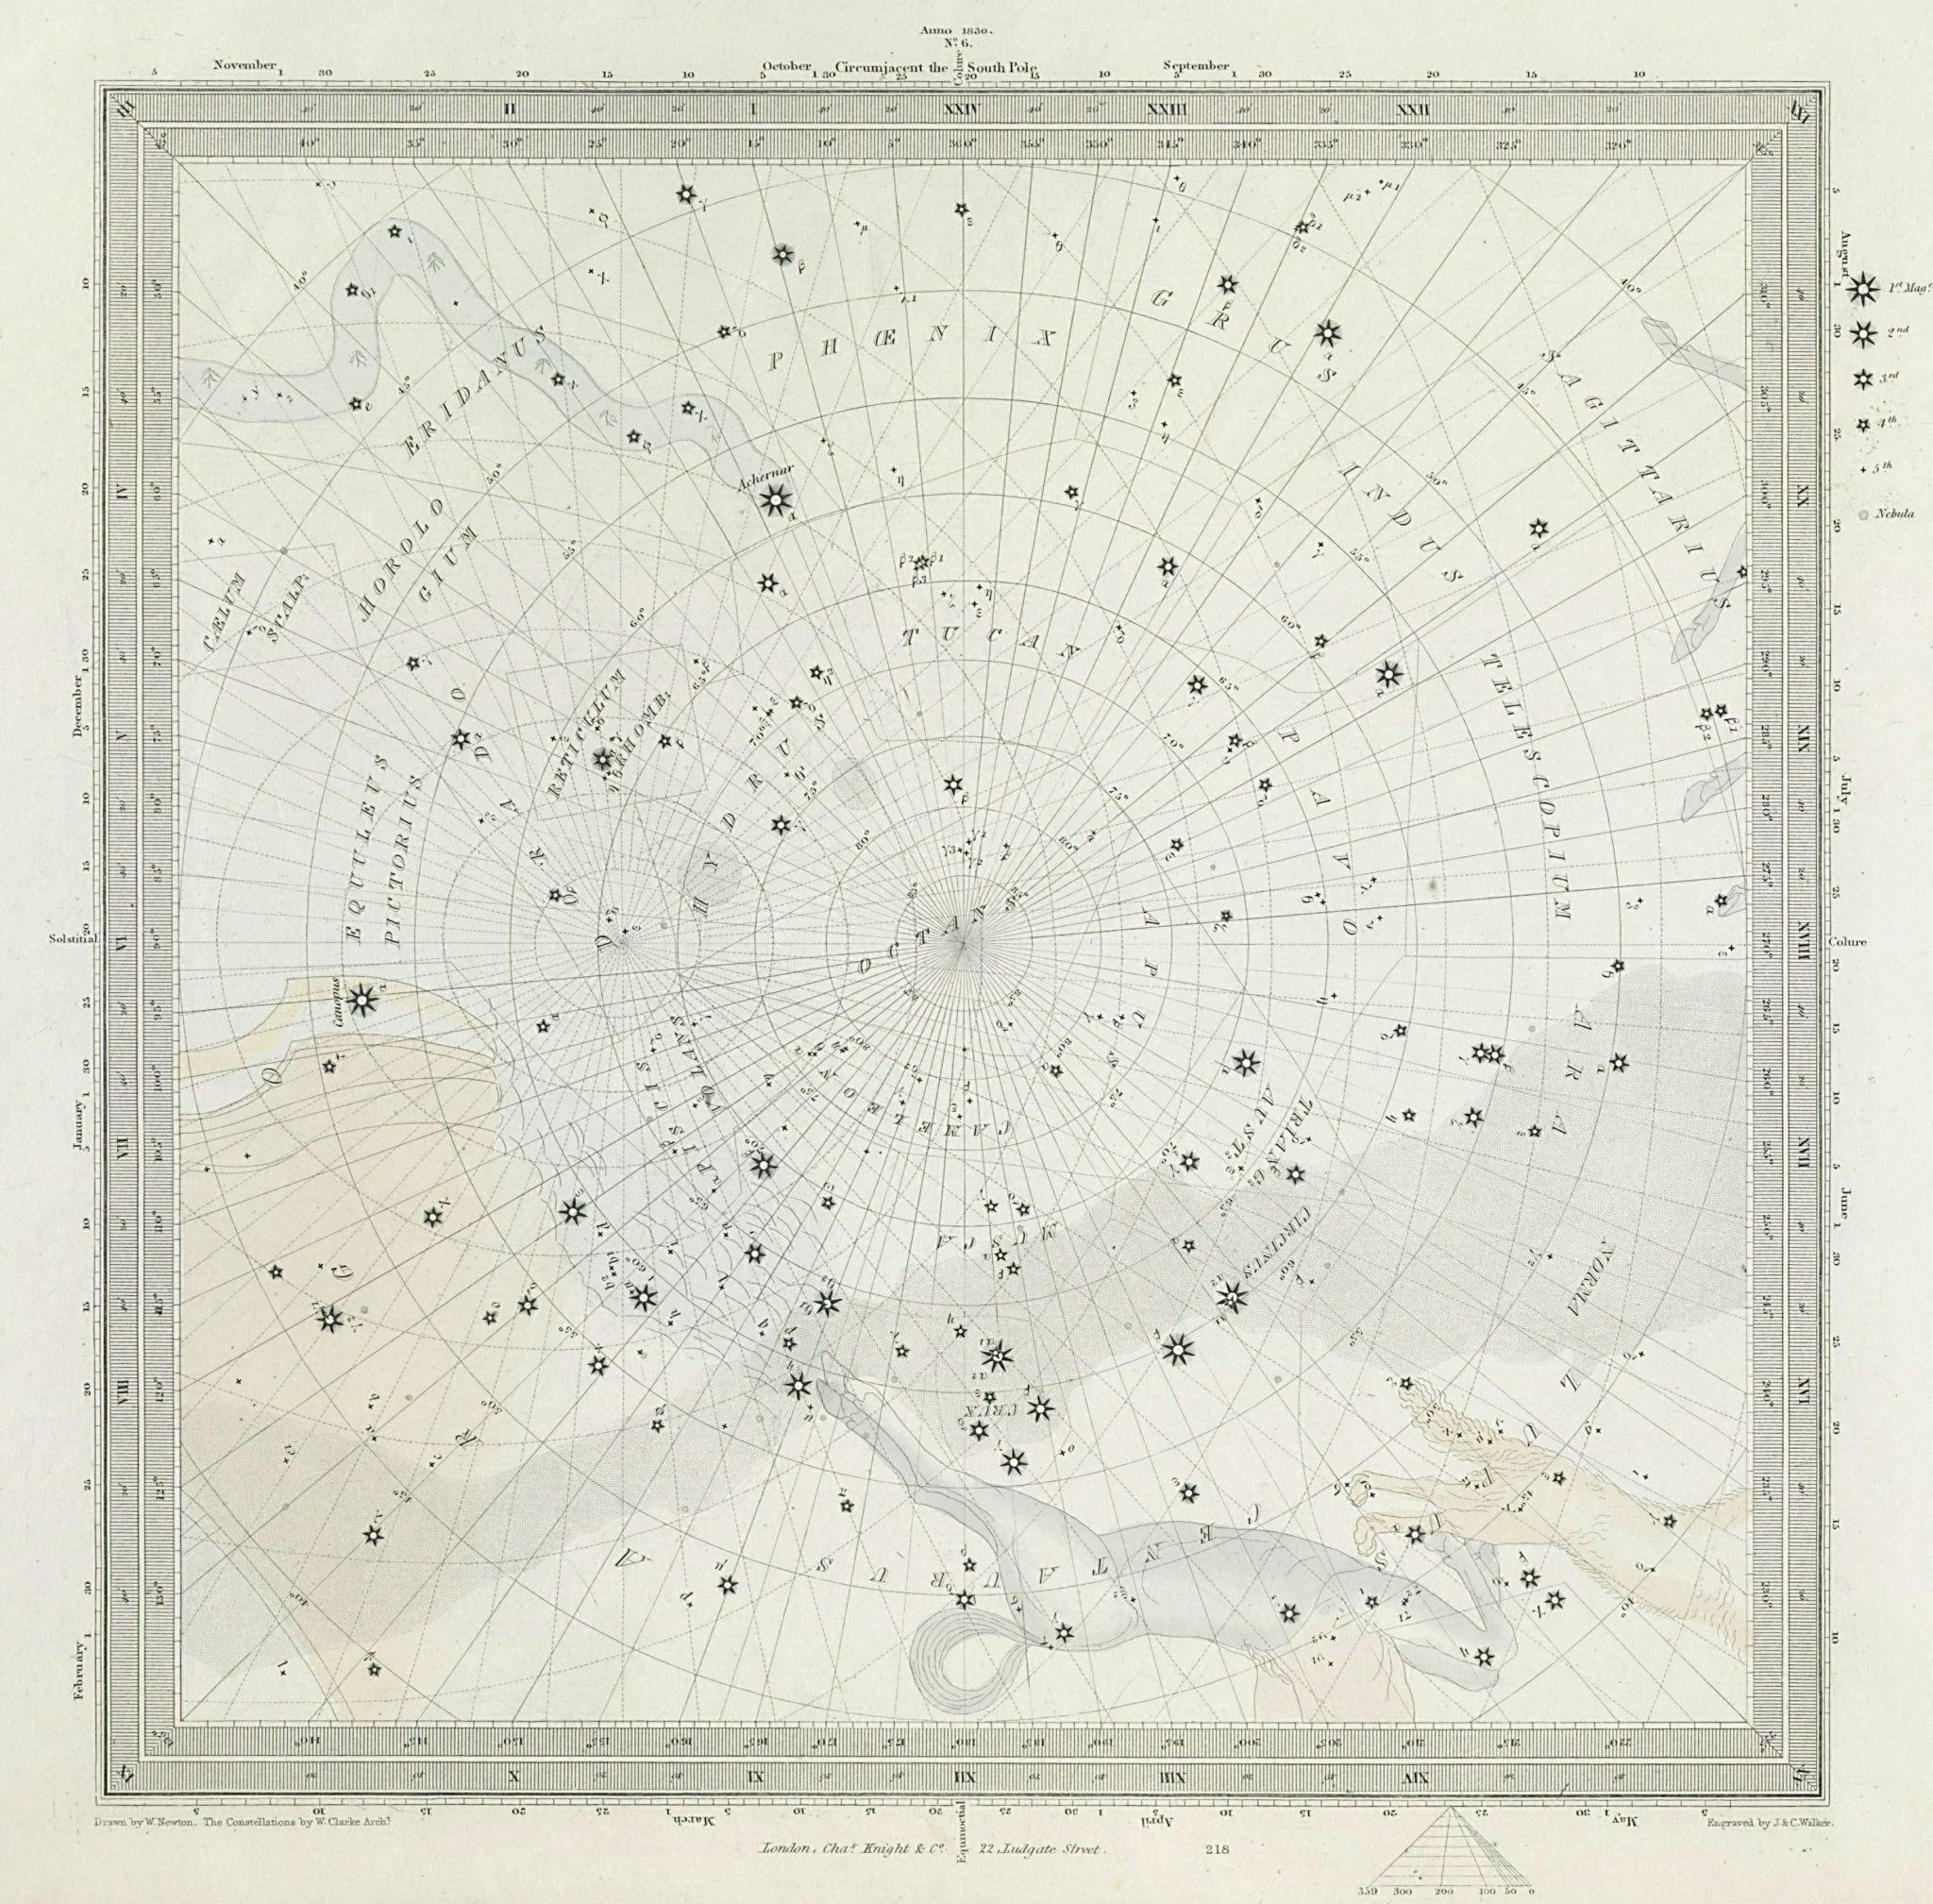 Associate Product ASTRONOMY CELESTIAL. Star map. Star chart, VI. South Pole. SDUK 1847 old